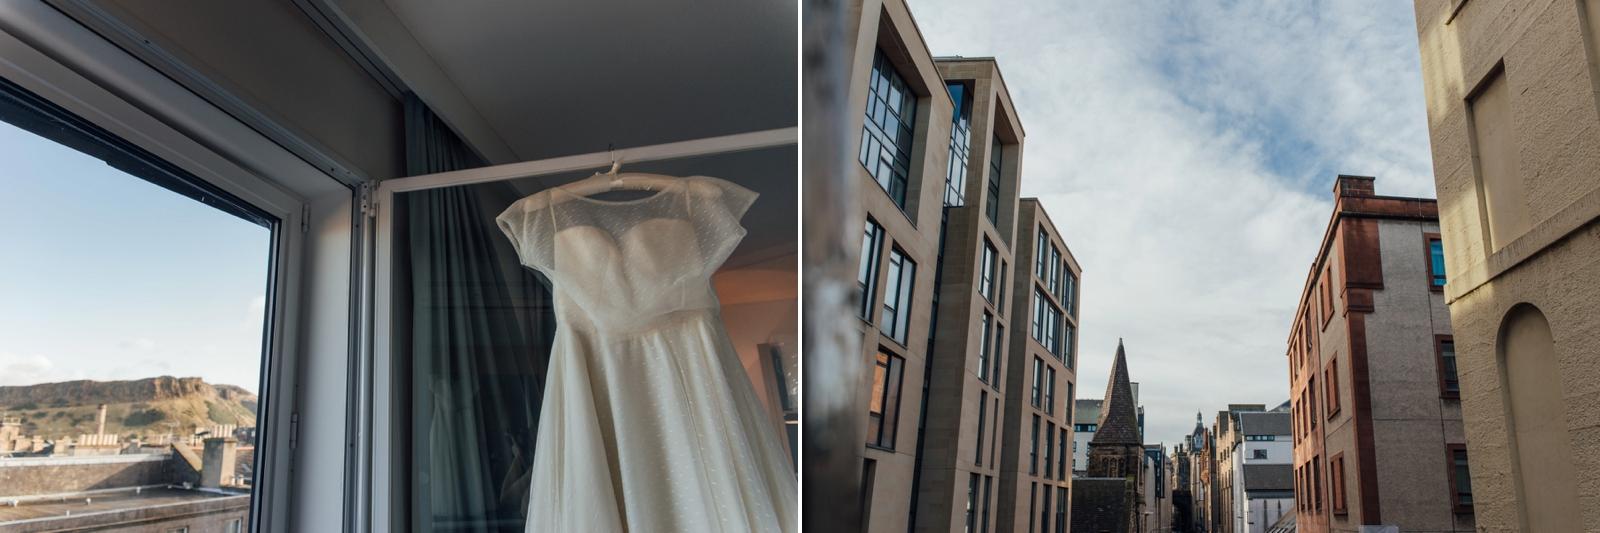 thecaves_retro_DIY_wedding_00004.jpg